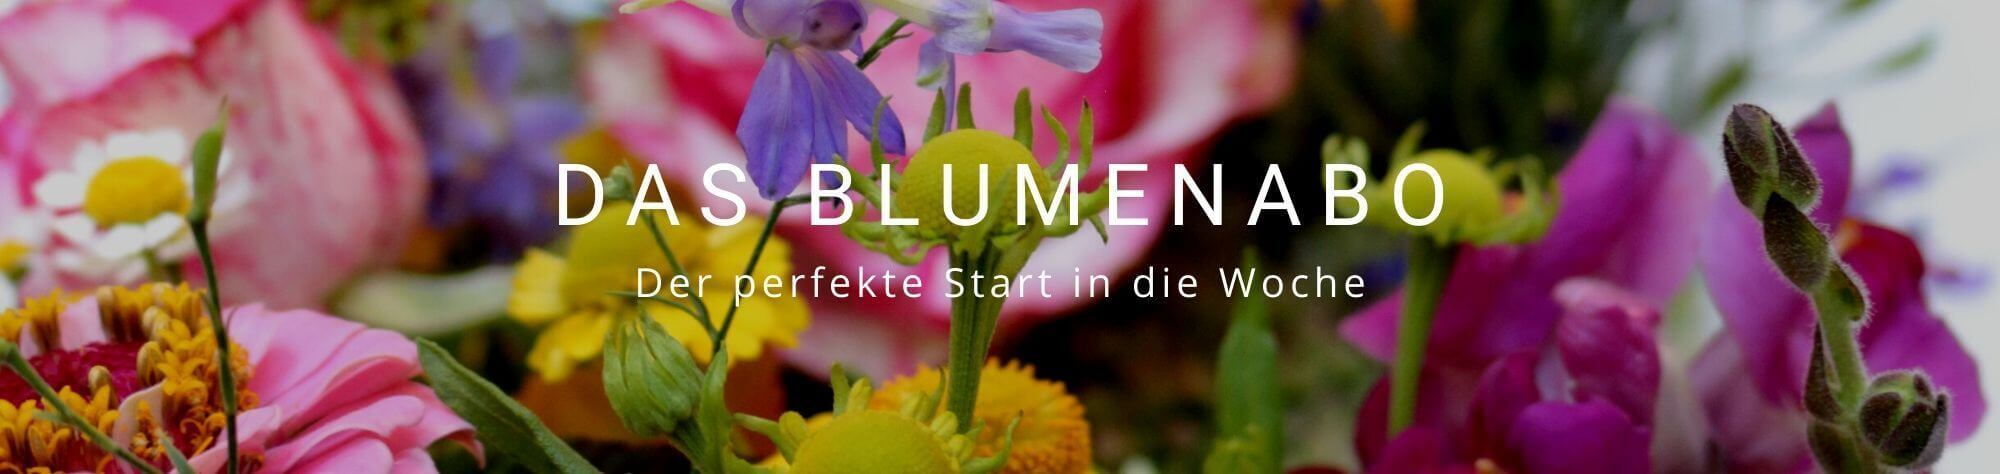 Blumenabo Düsseldorf Blumen Abo